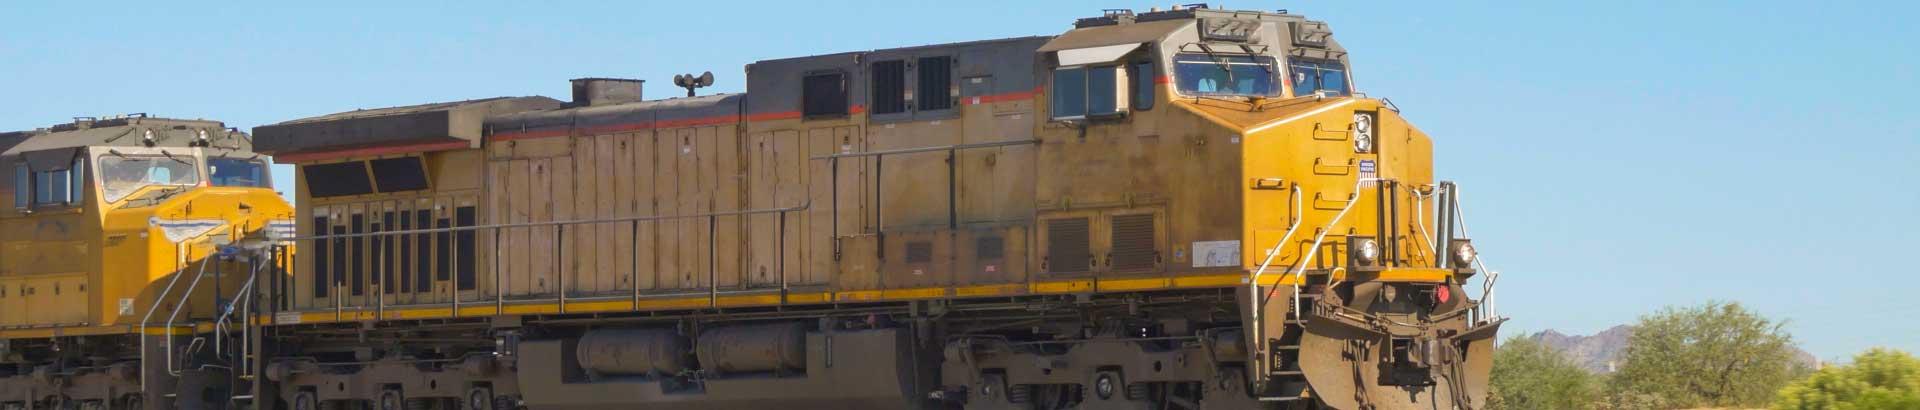 train transportation locomotive jobs military